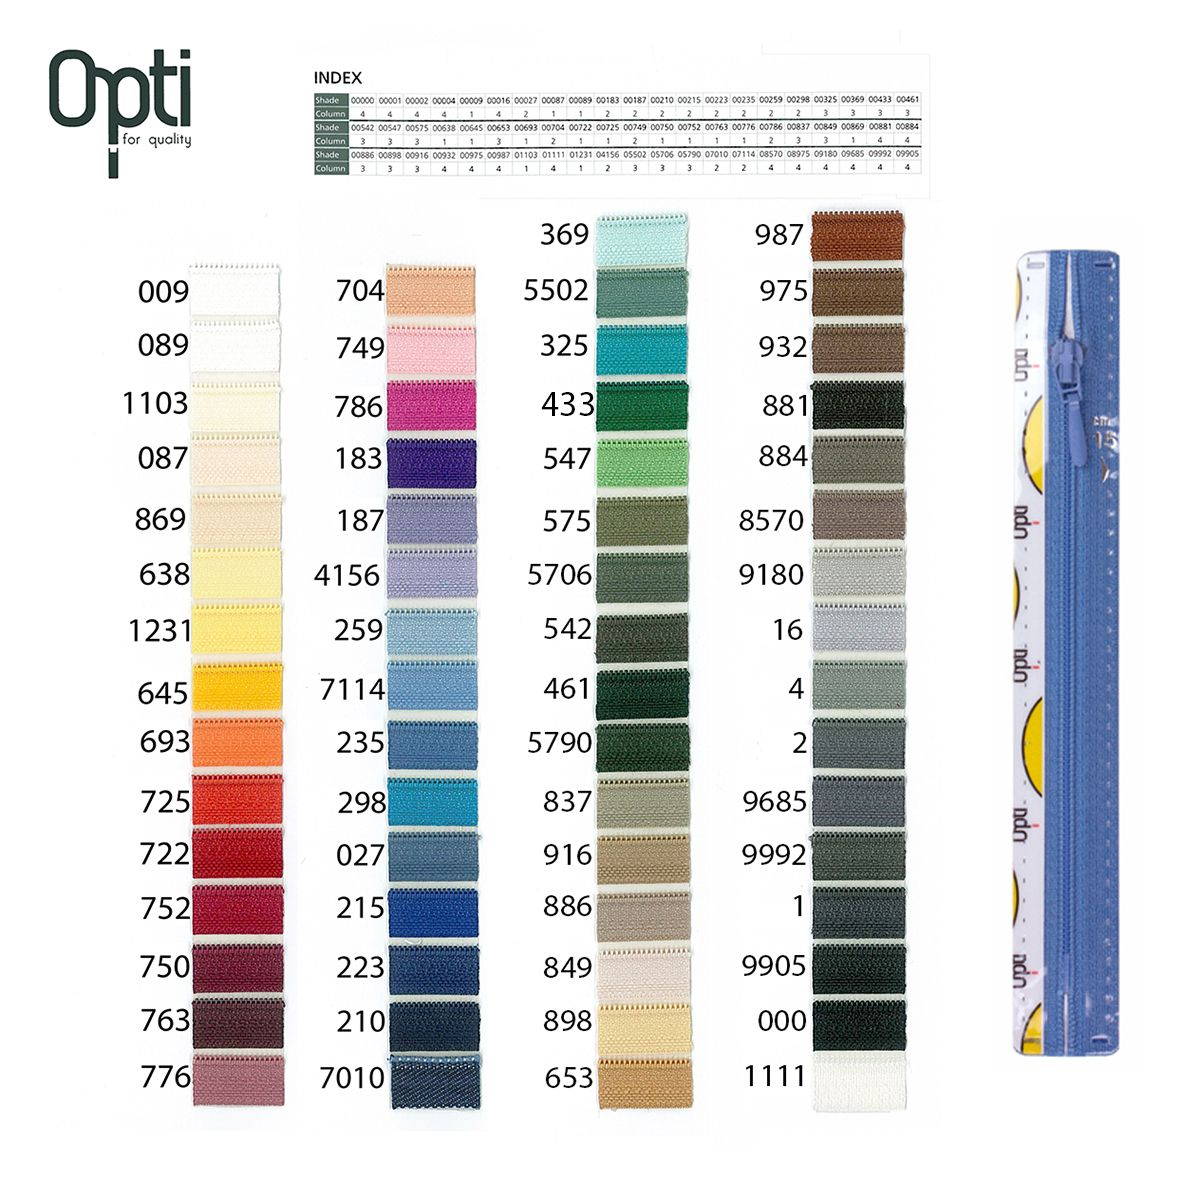 Rits;Opti-Lon S40 Mint Groen-325